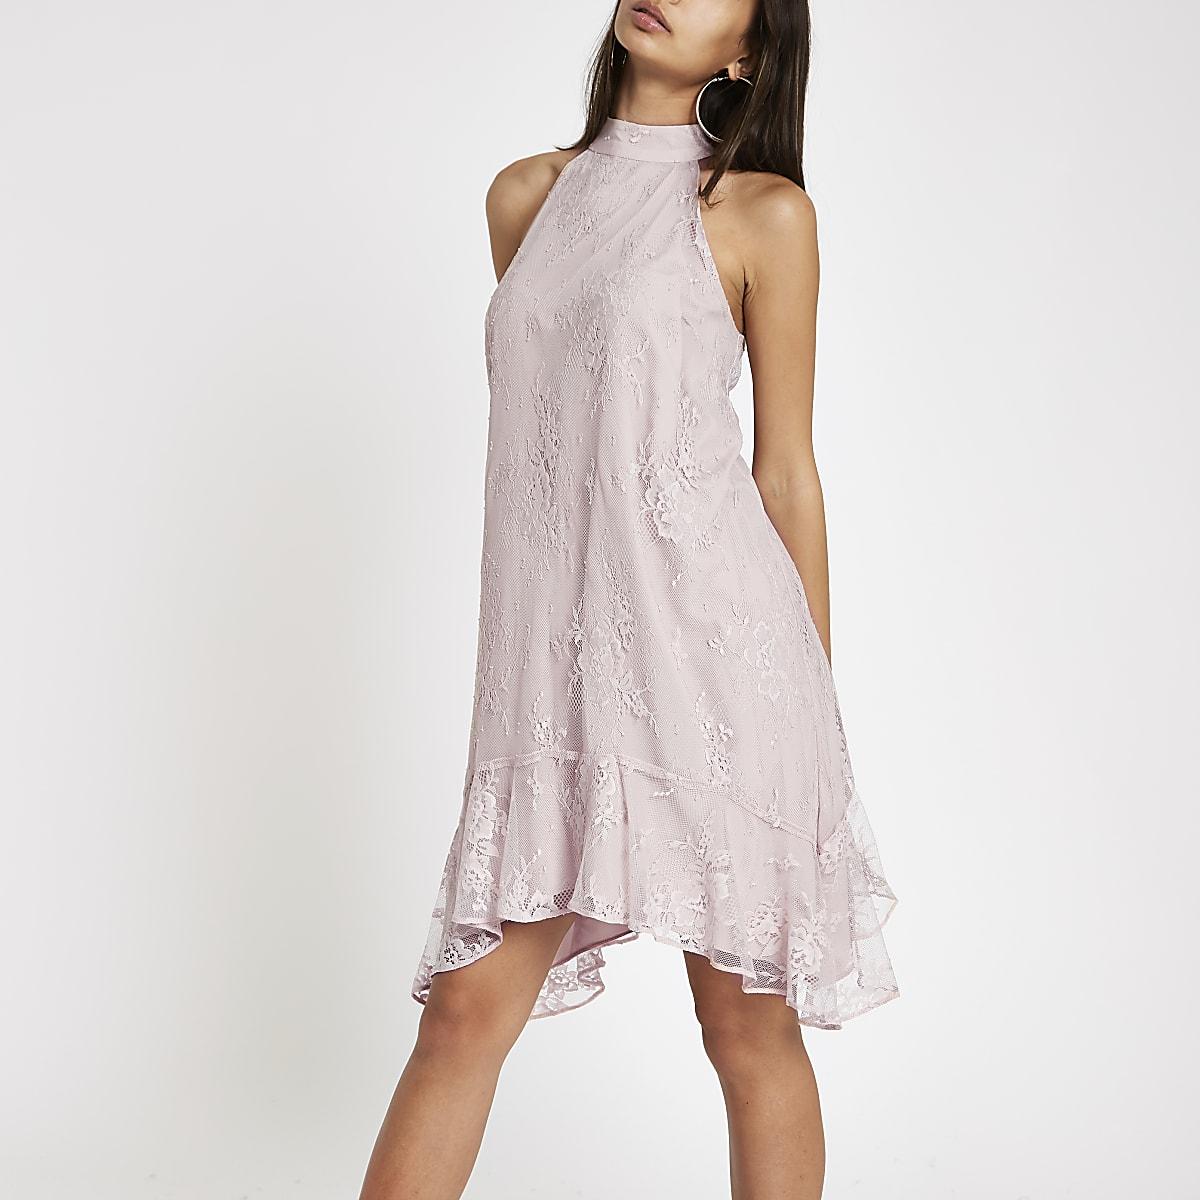 1c676c0e1bd09 Pink lace frill hem halter neck swing dress - Swing Dresses - Dresses -  women